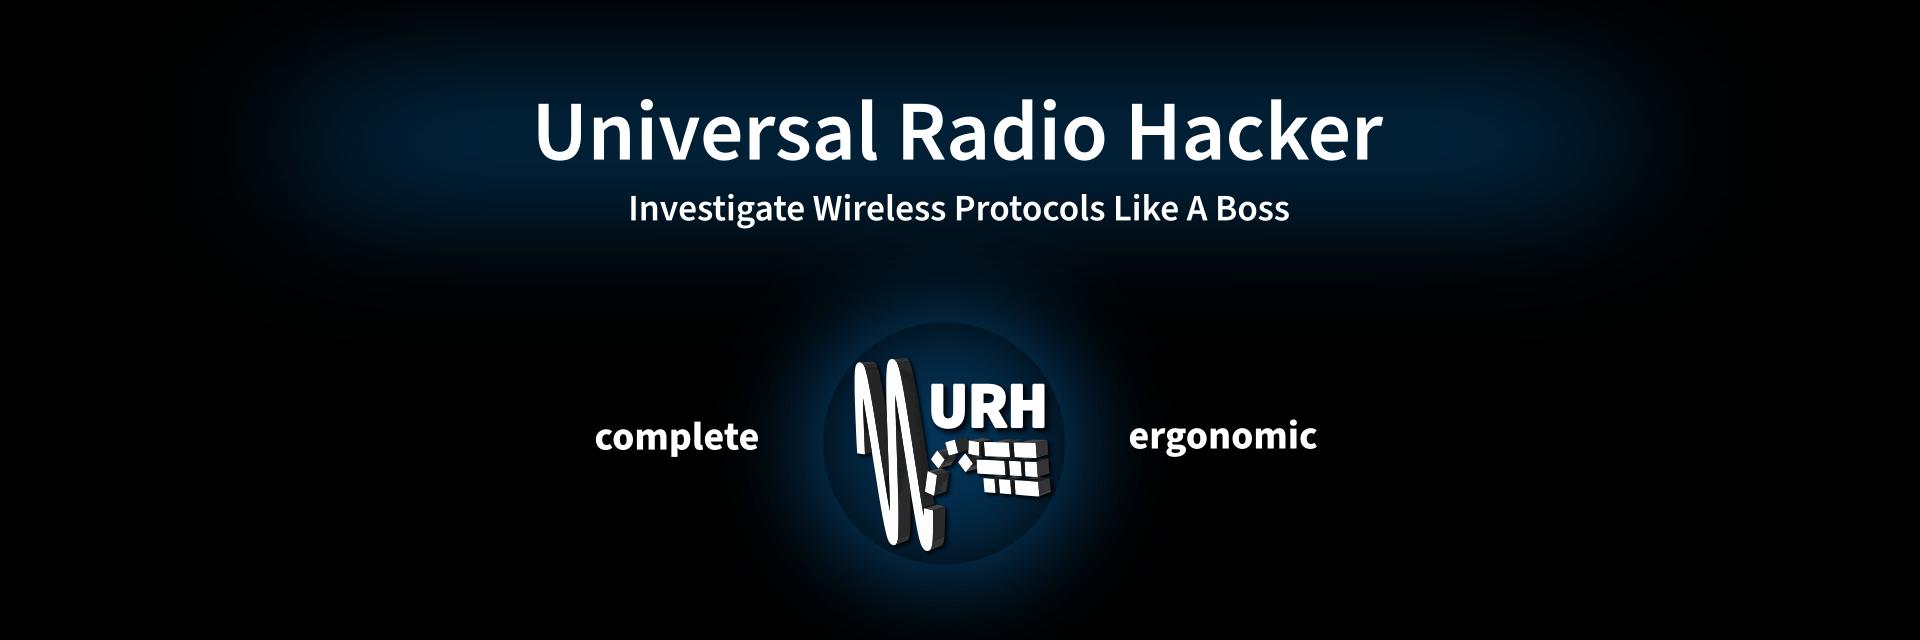 Universal Radio Hacker banner